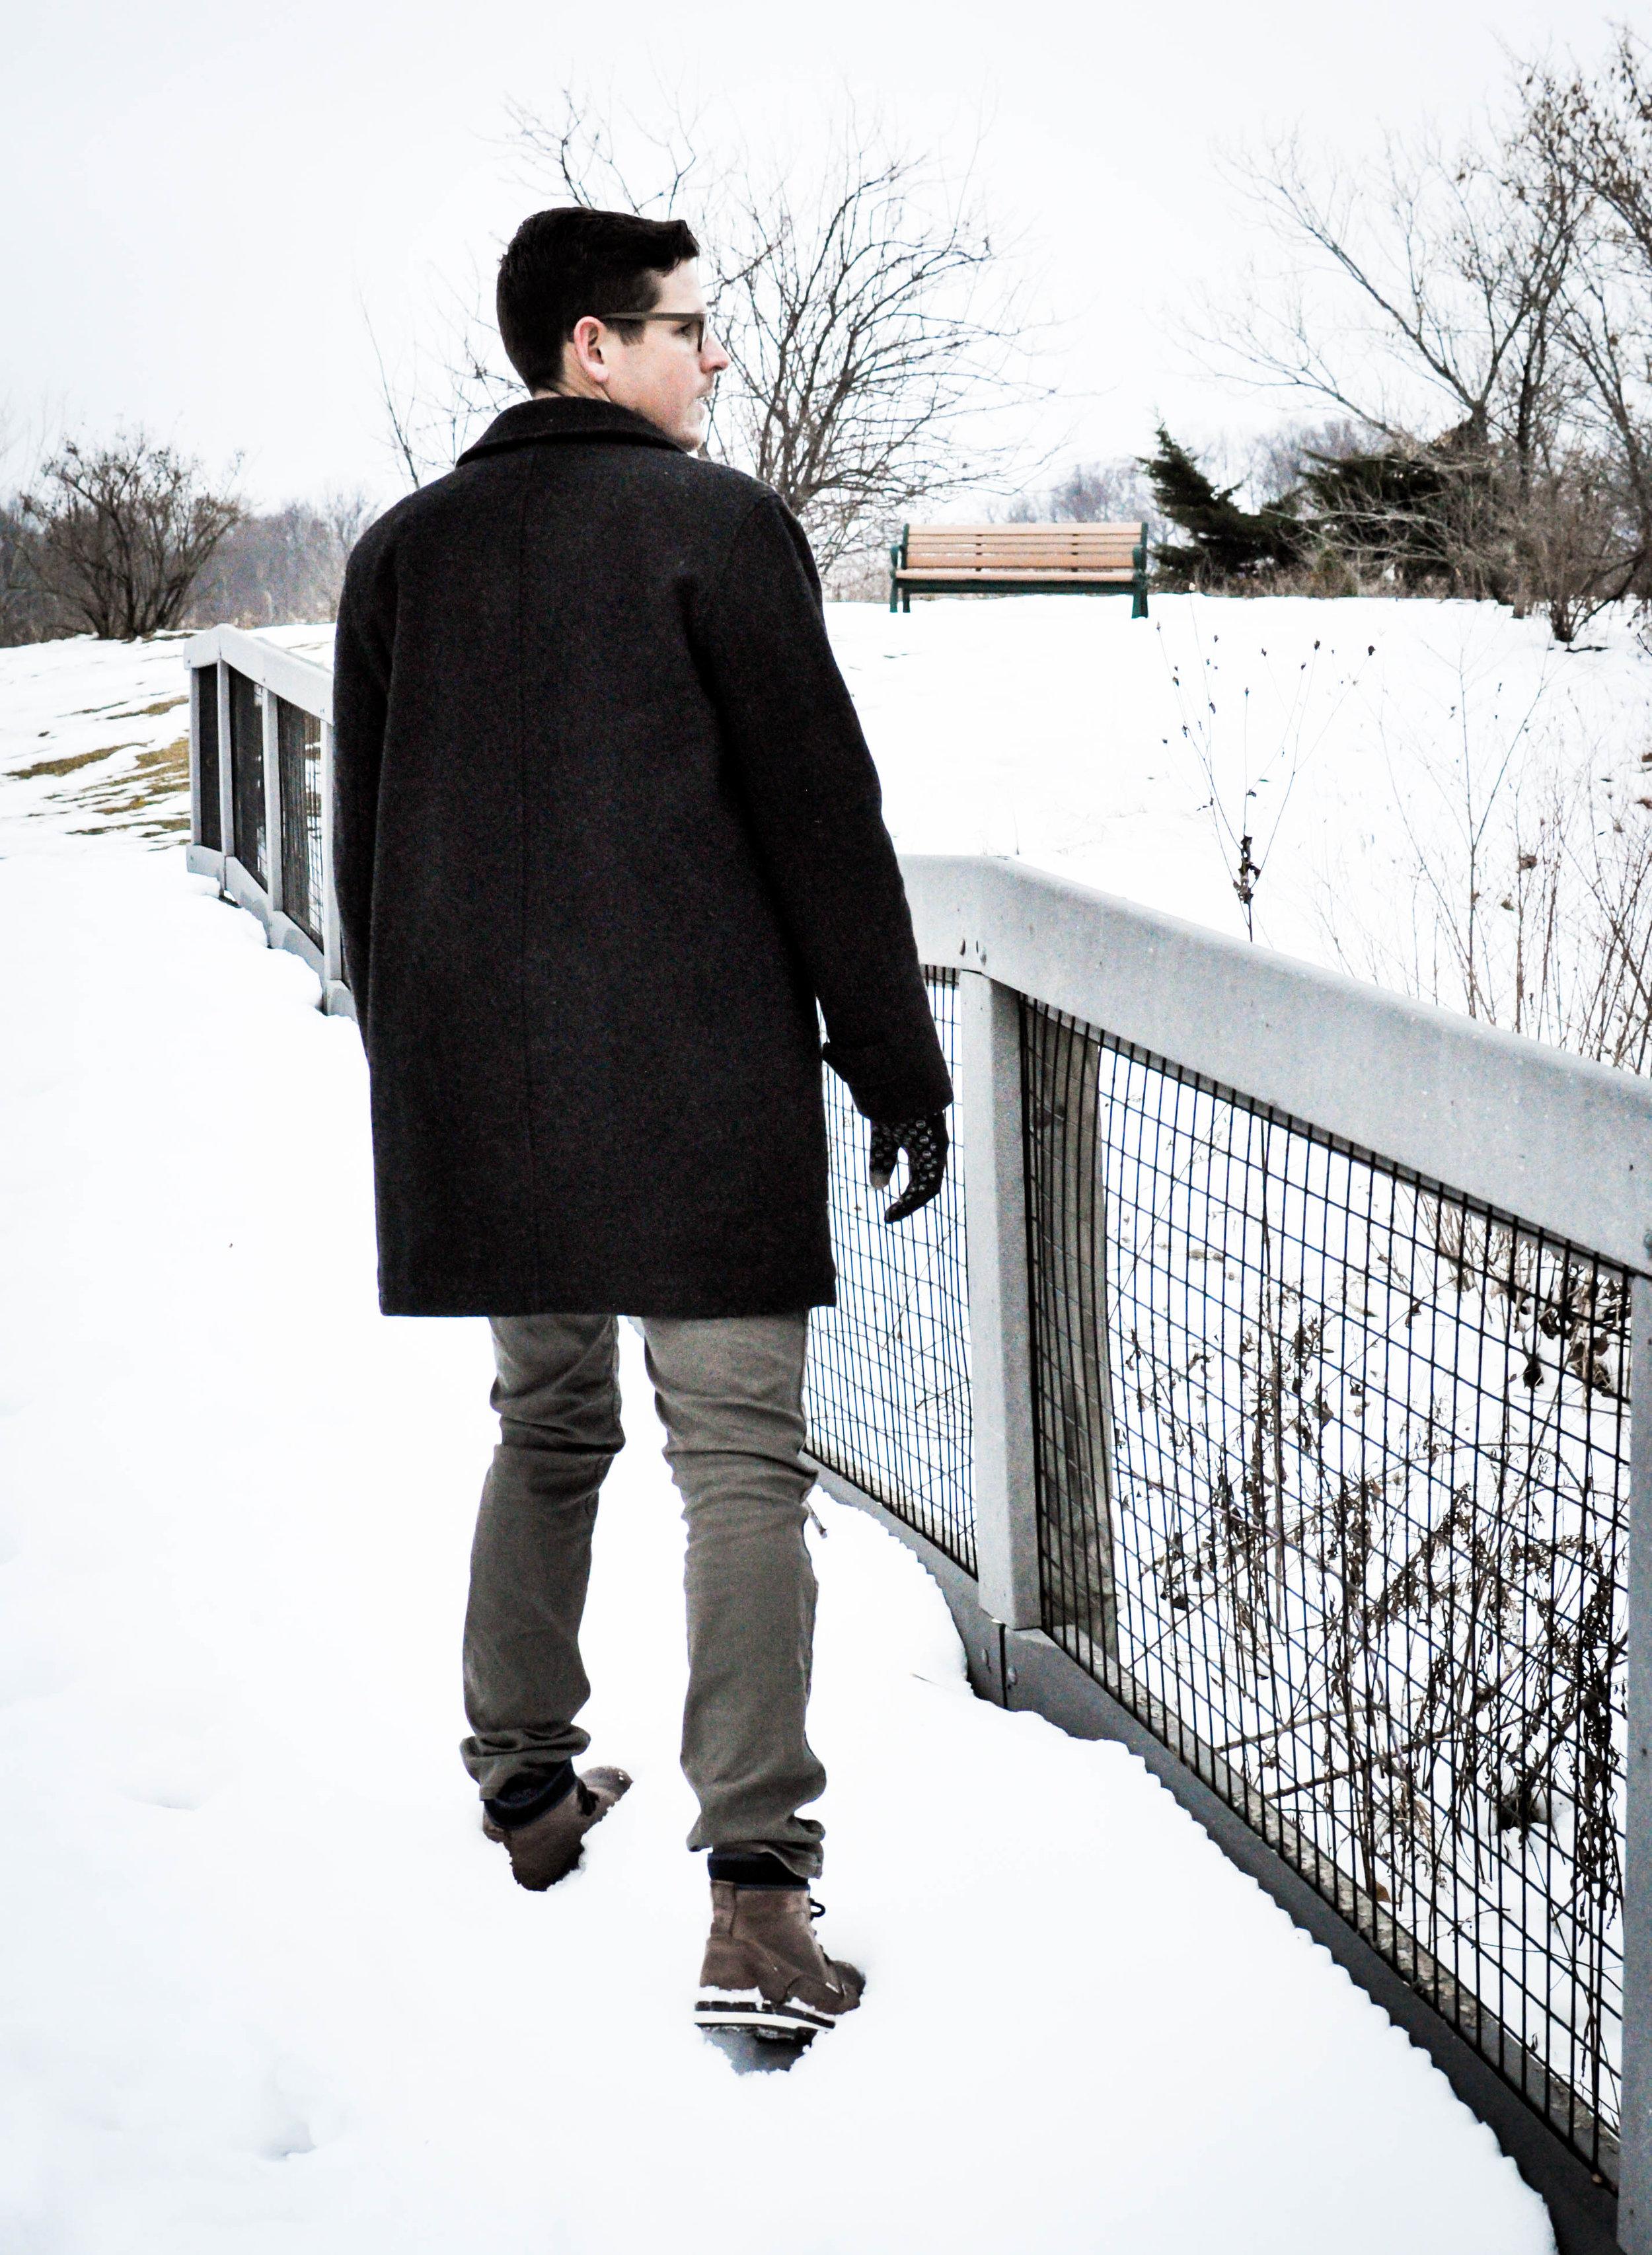 Man in black coat walking in snow